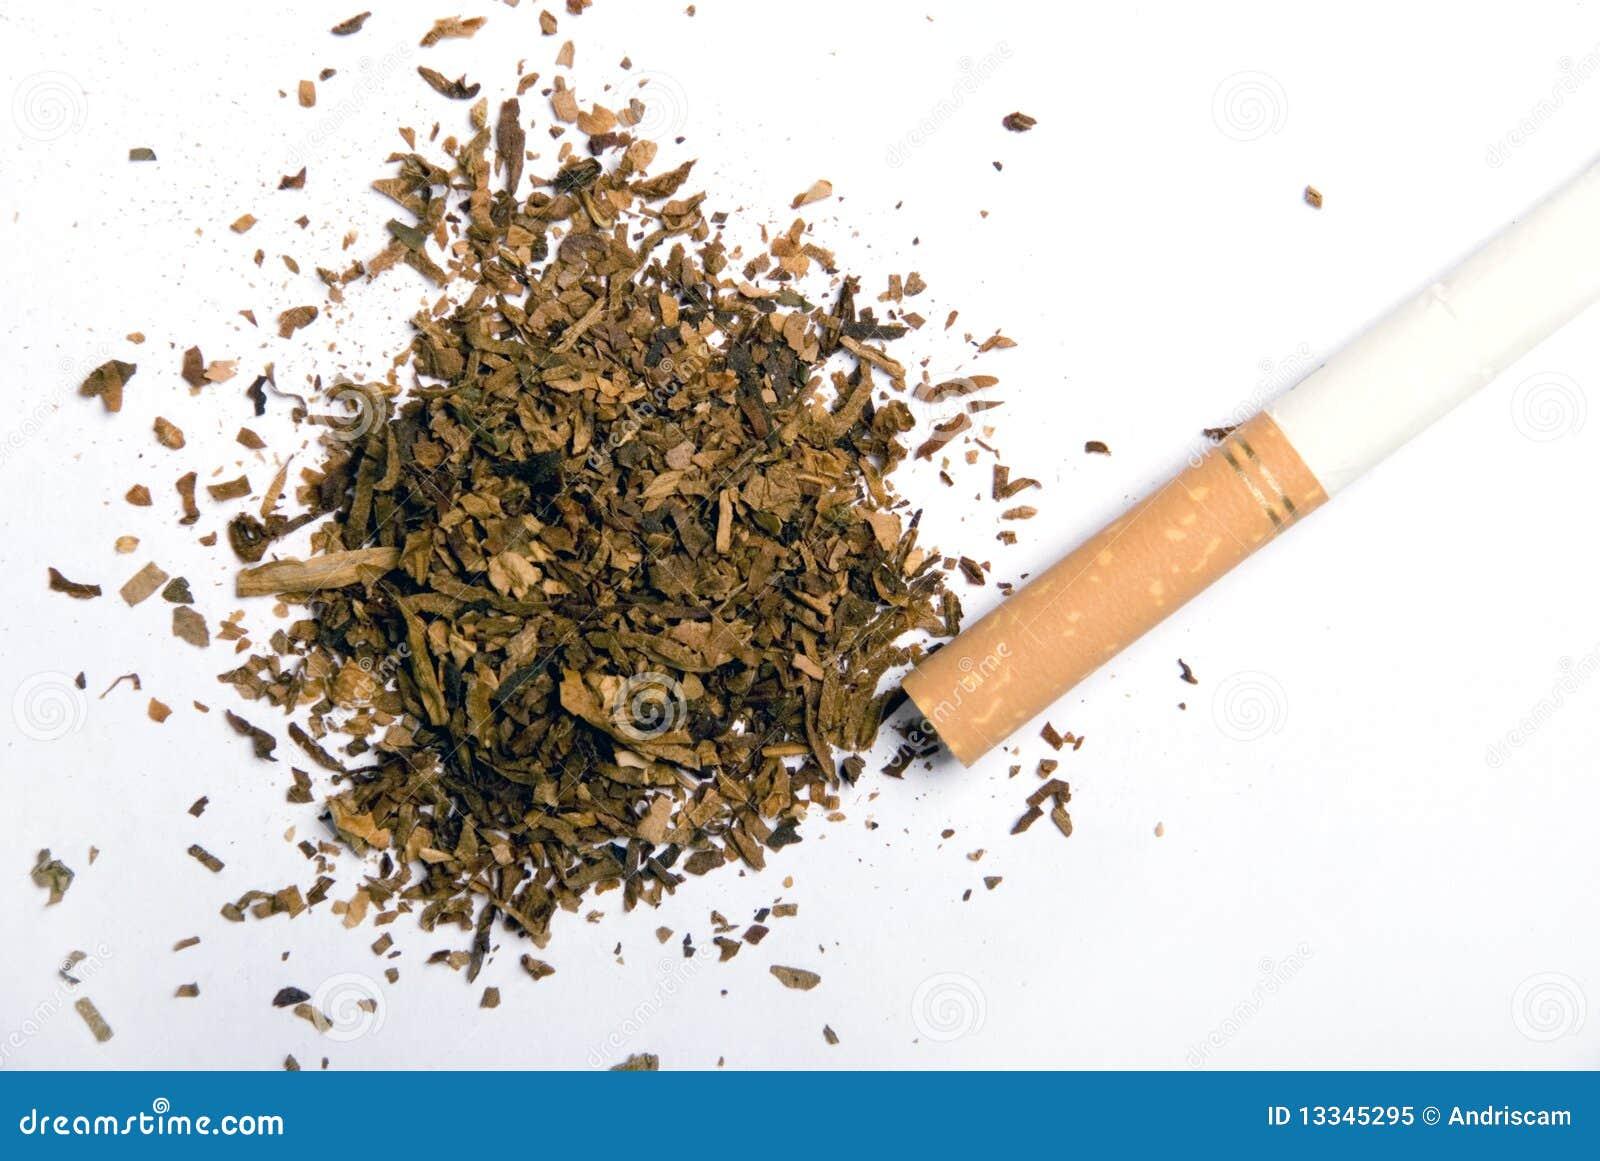 nikotin stockbild bild von nikotin gebrochen neigung 13345295. Black Bedroom Furniture Sets. Home Design Ideas